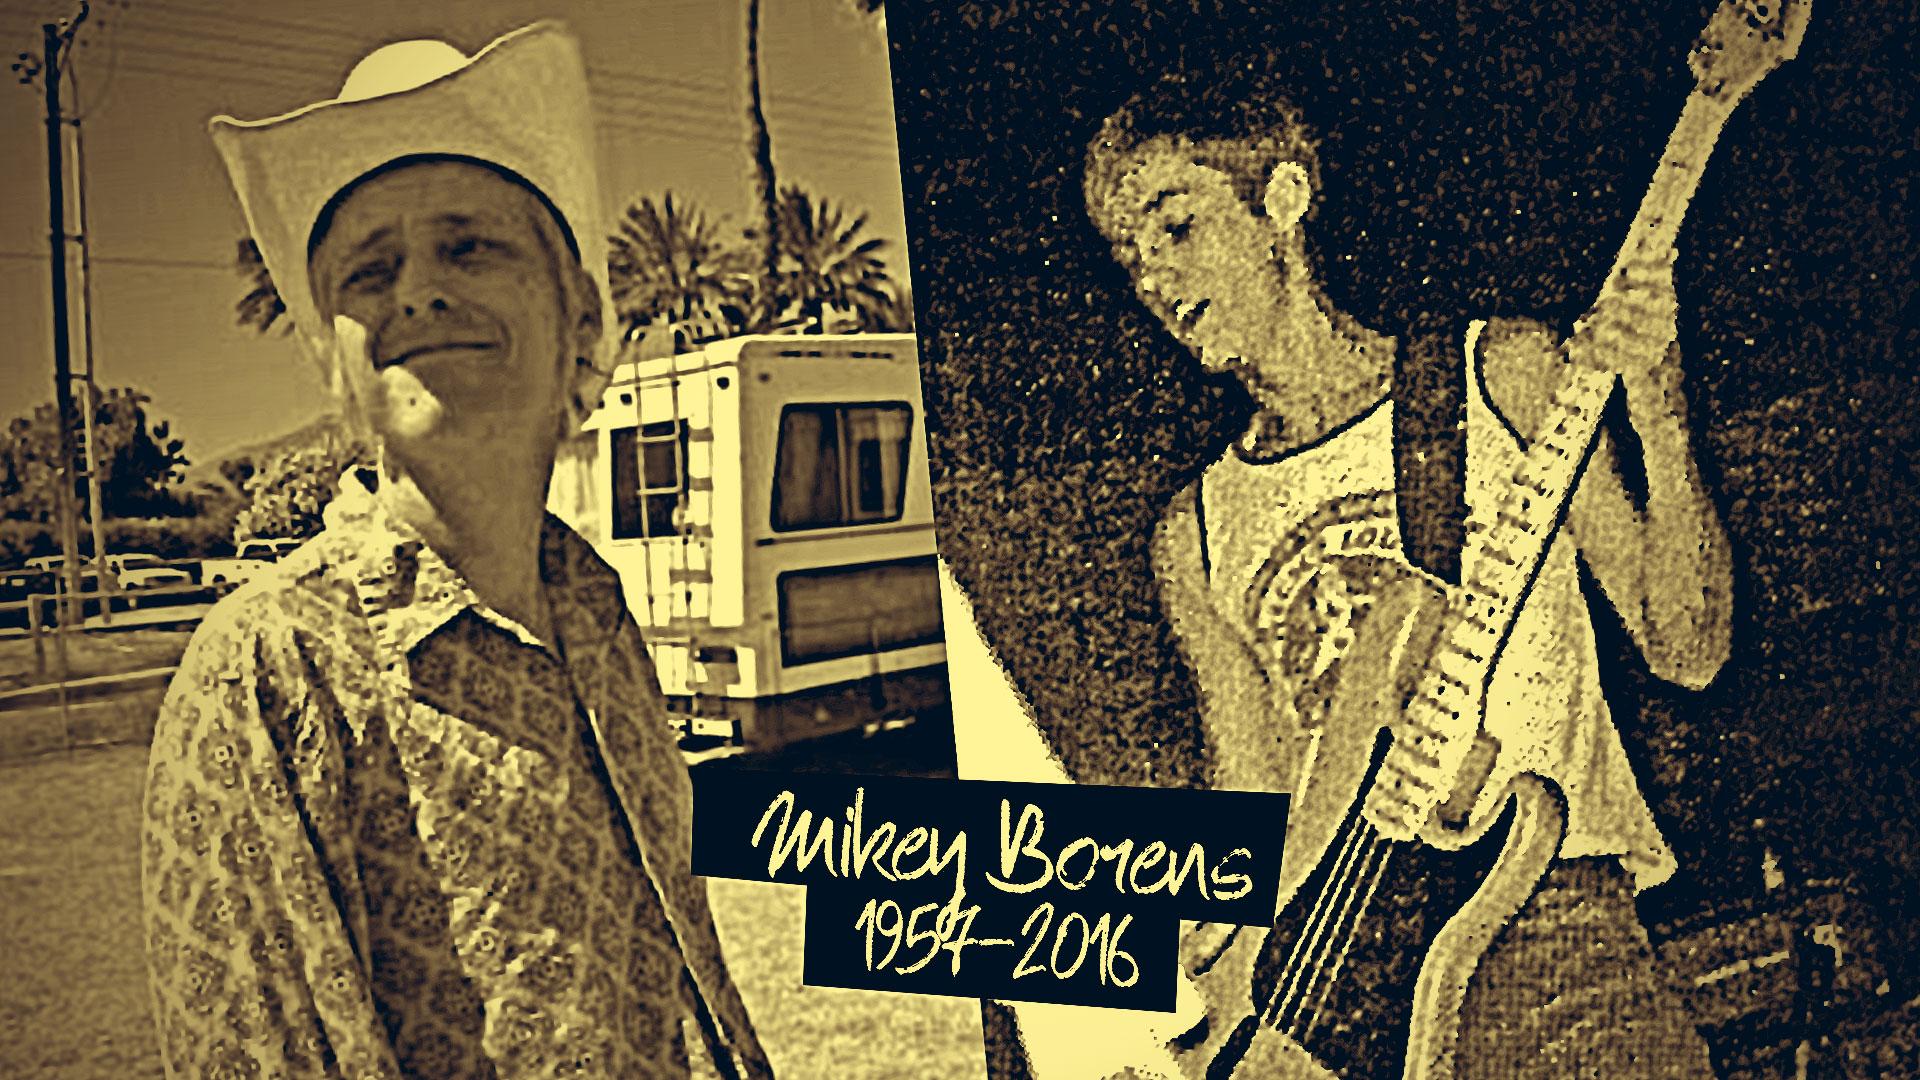 Mikey Borens 1957 - 2016